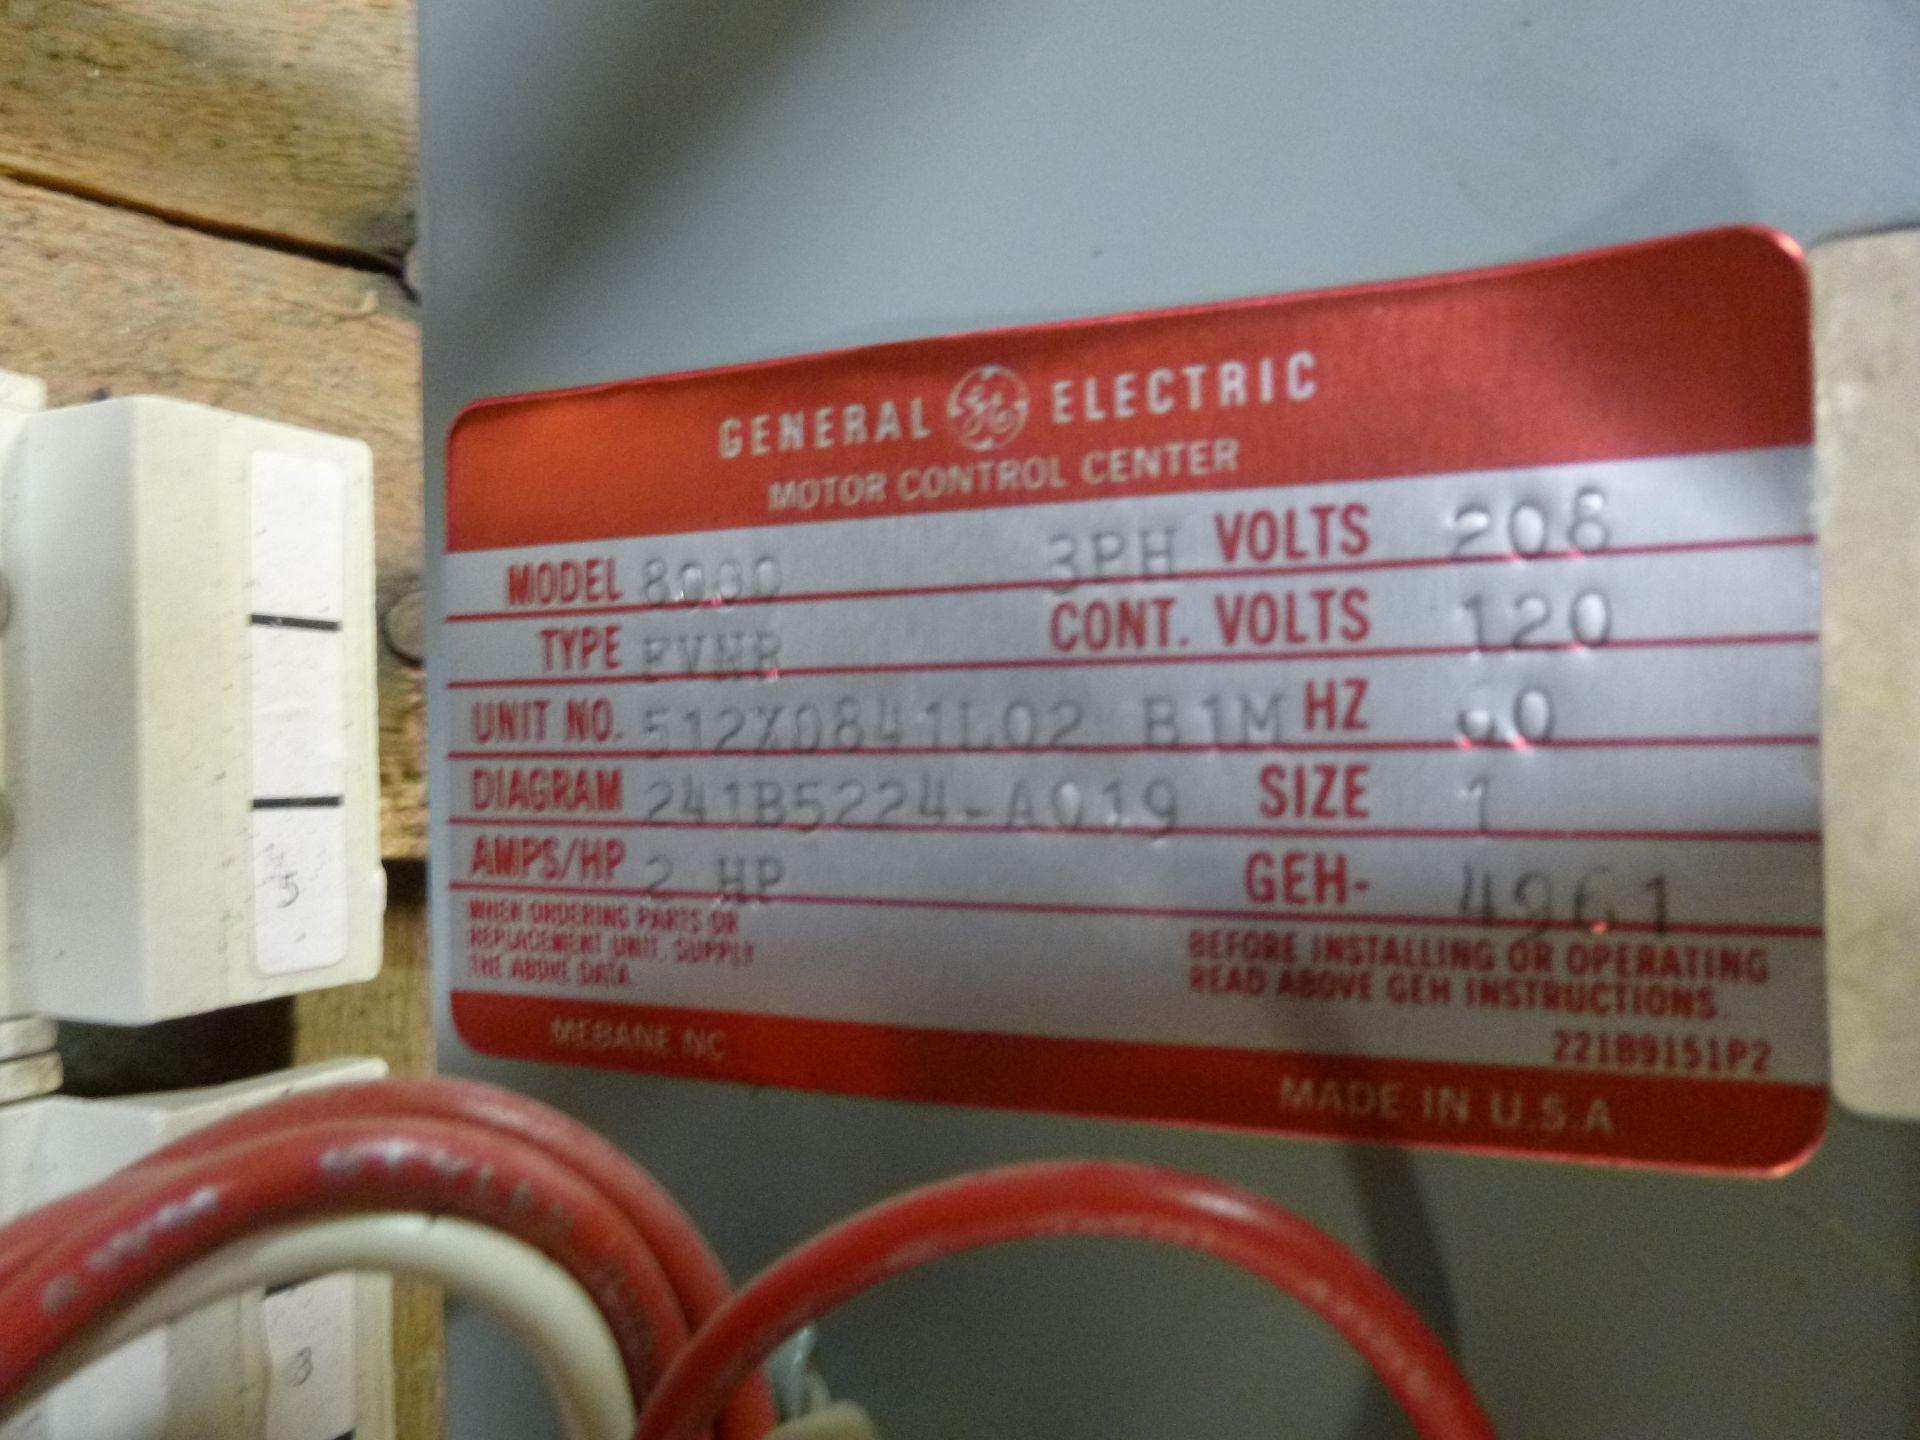 Lot 53 - GE motor control center MCC bucket model 8000, type FVNR, 3 phase, 208v, 2 hp, size 1 bucket,